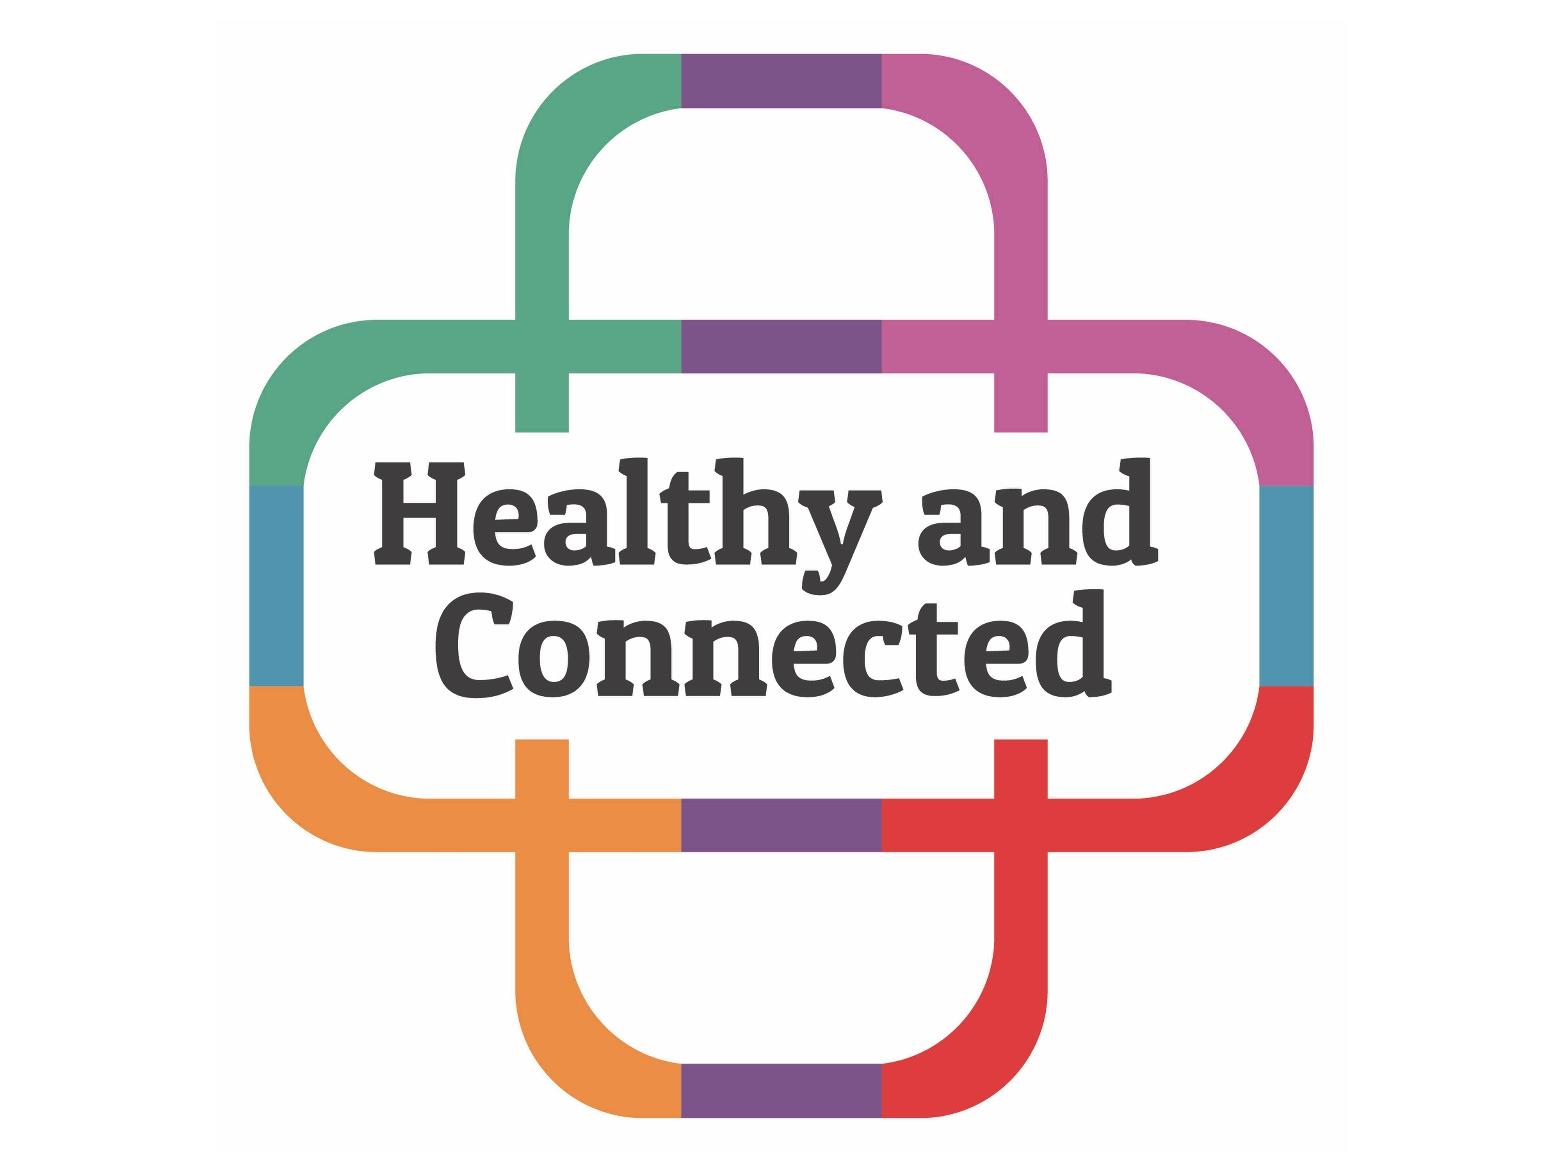 RESOURCES: Celebrating Carers Week (11-17 June)